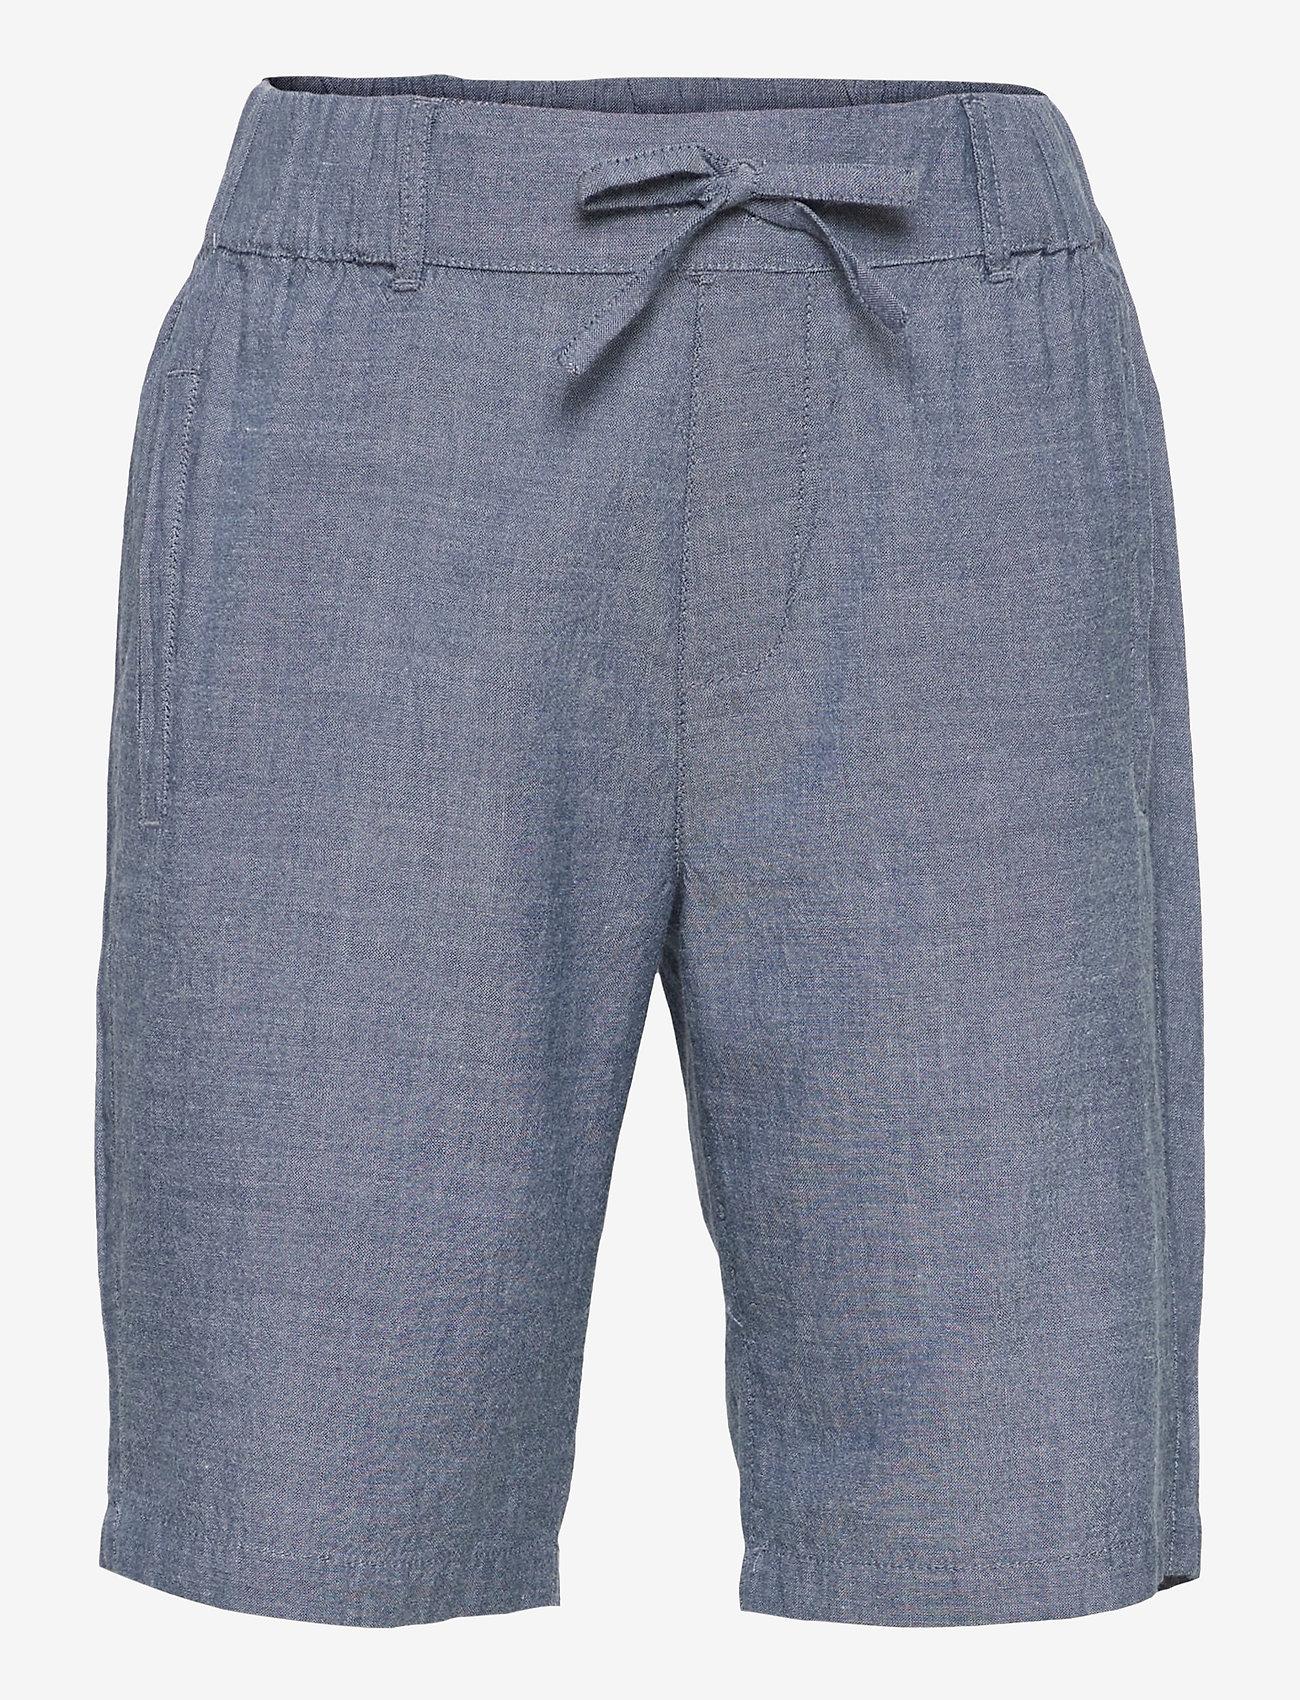 MarMar Cph - Peter - shorts - denim blue - 0